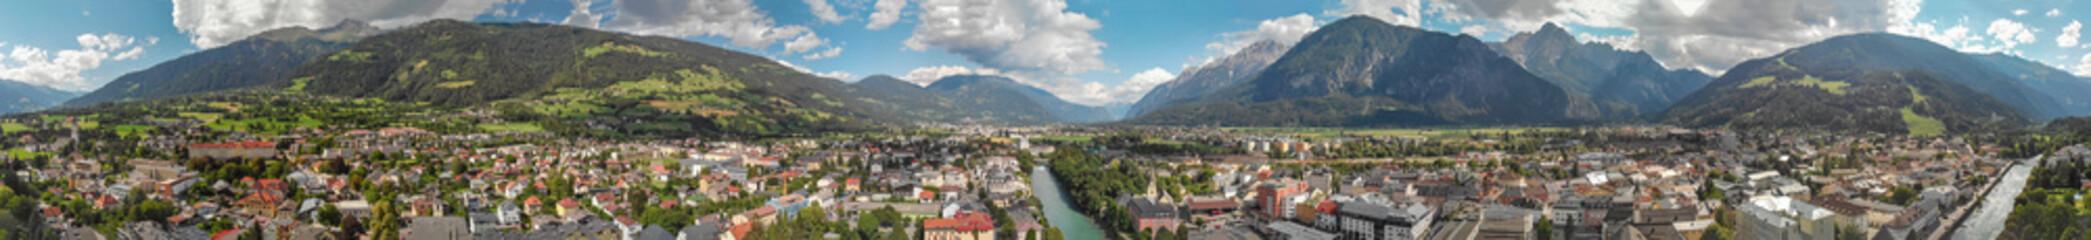 Beautiful aerial panoramic view of Lienz, Austria